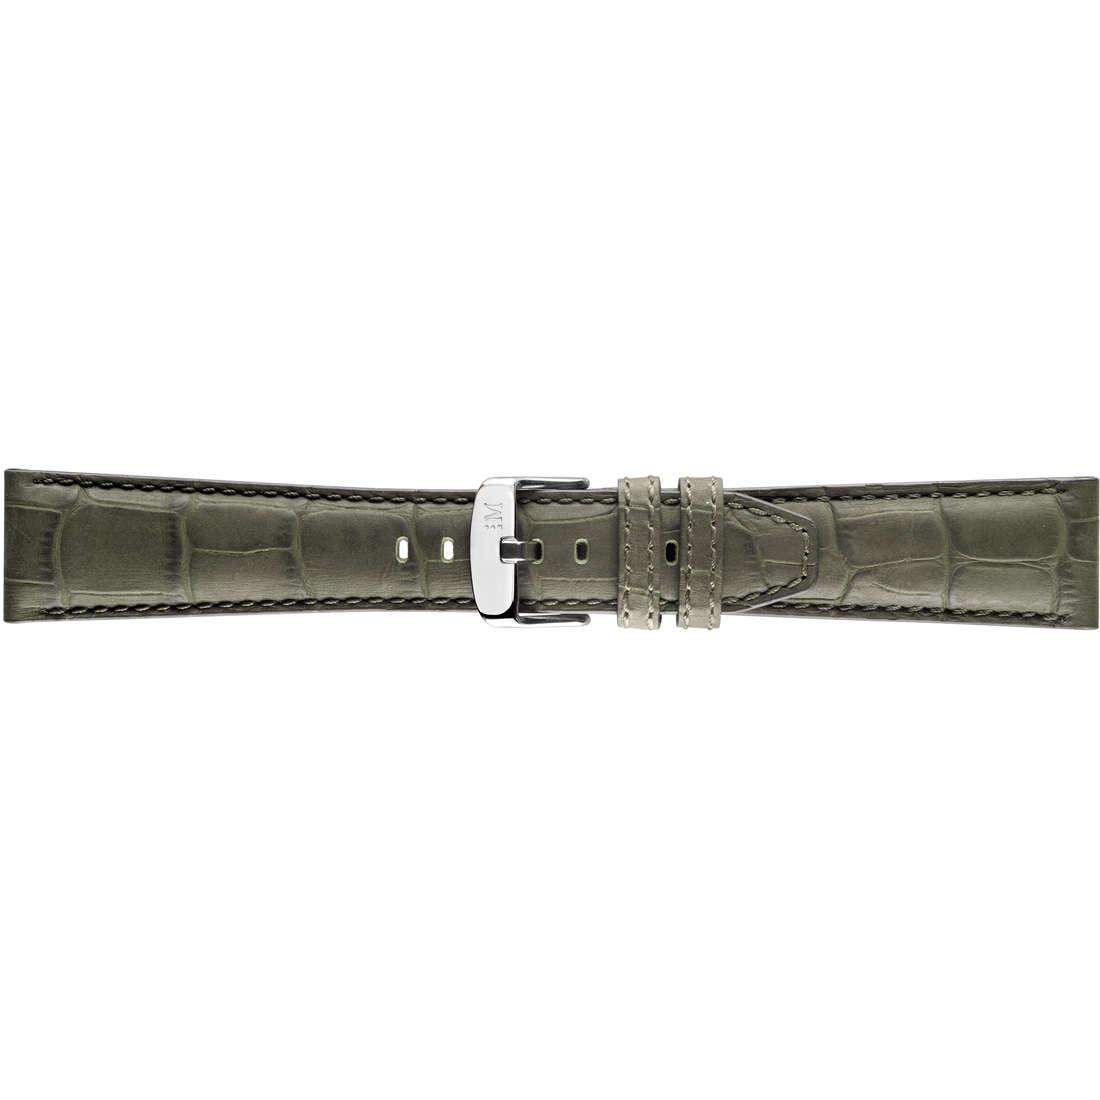 watch watch bands watch straps man Morellato Linea Sport A01X4497B44073CR18